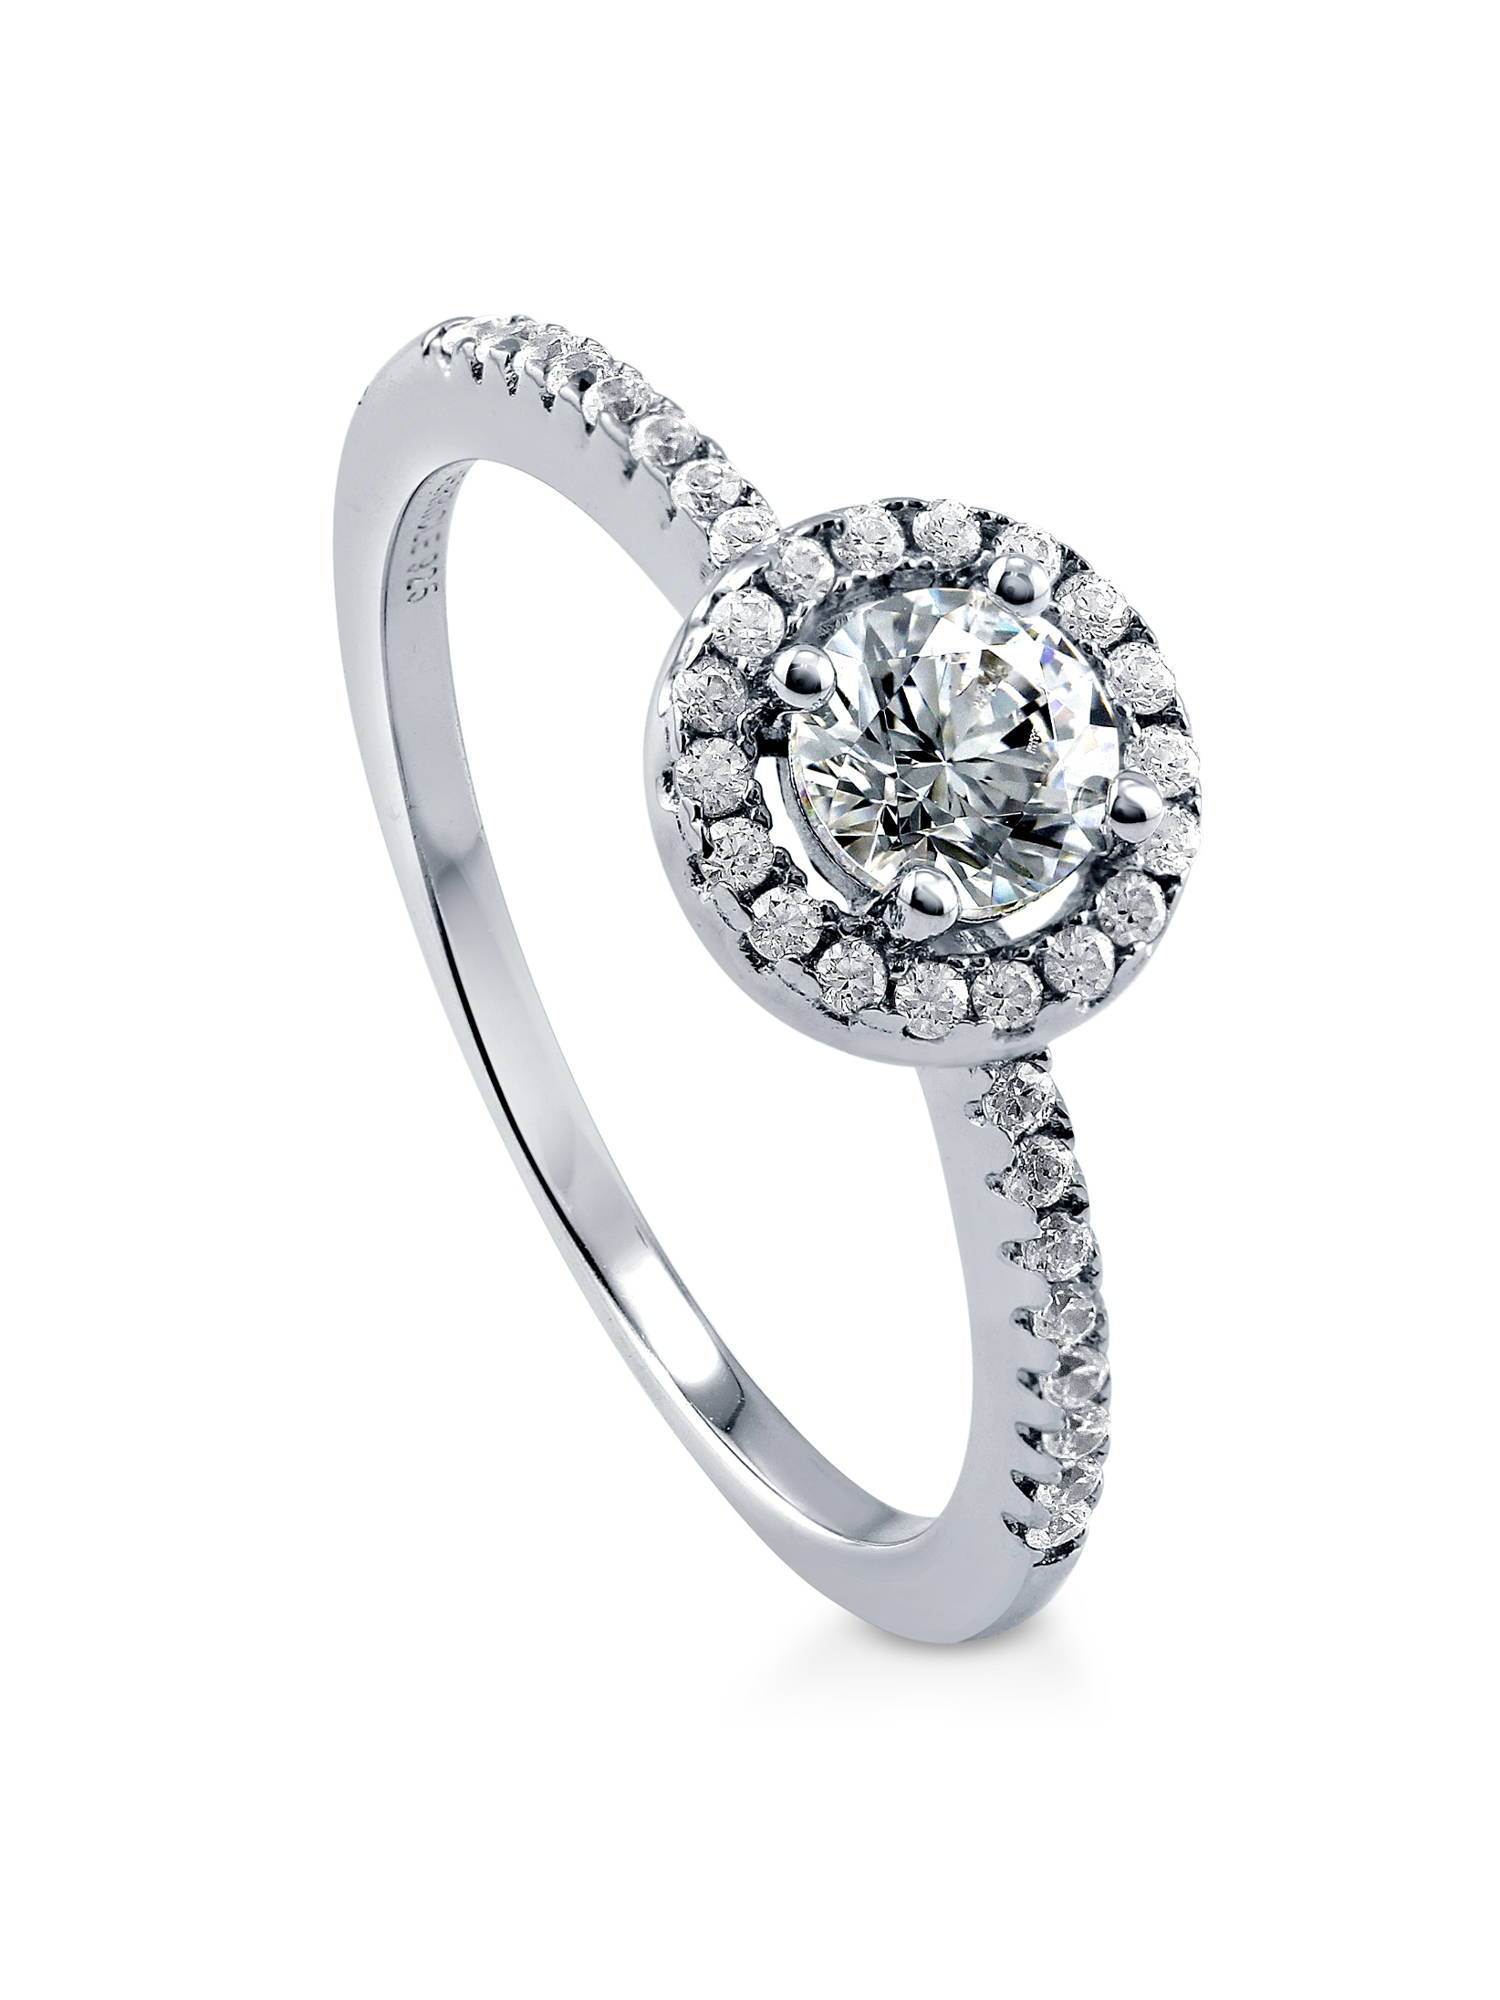 Rhodium Plated Sterling Silver Halo Promise Engagement Ring Set w/ Swarovski Zirconia Size 10.5